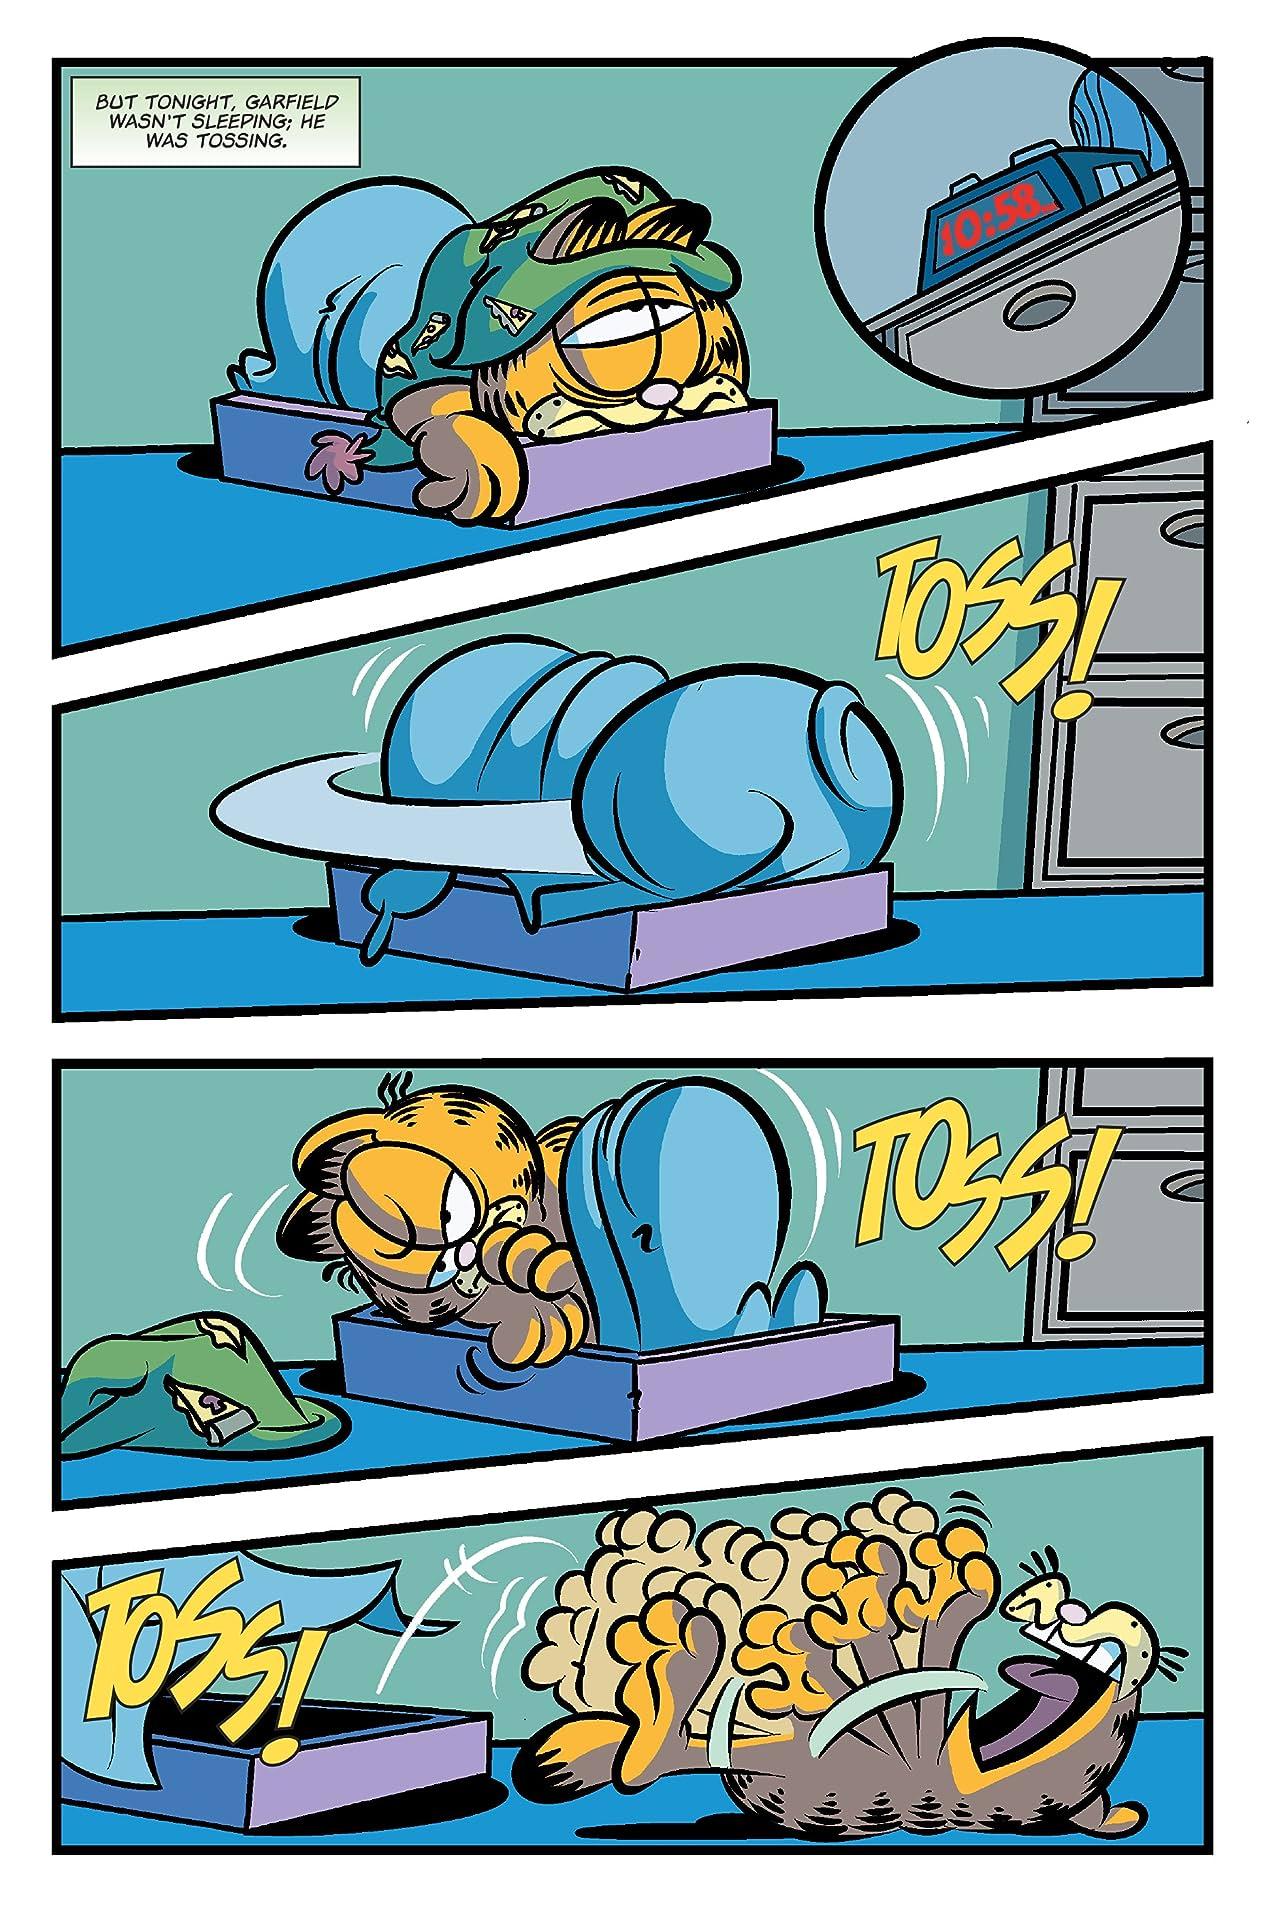 Garfield: The Thing in the Fridge